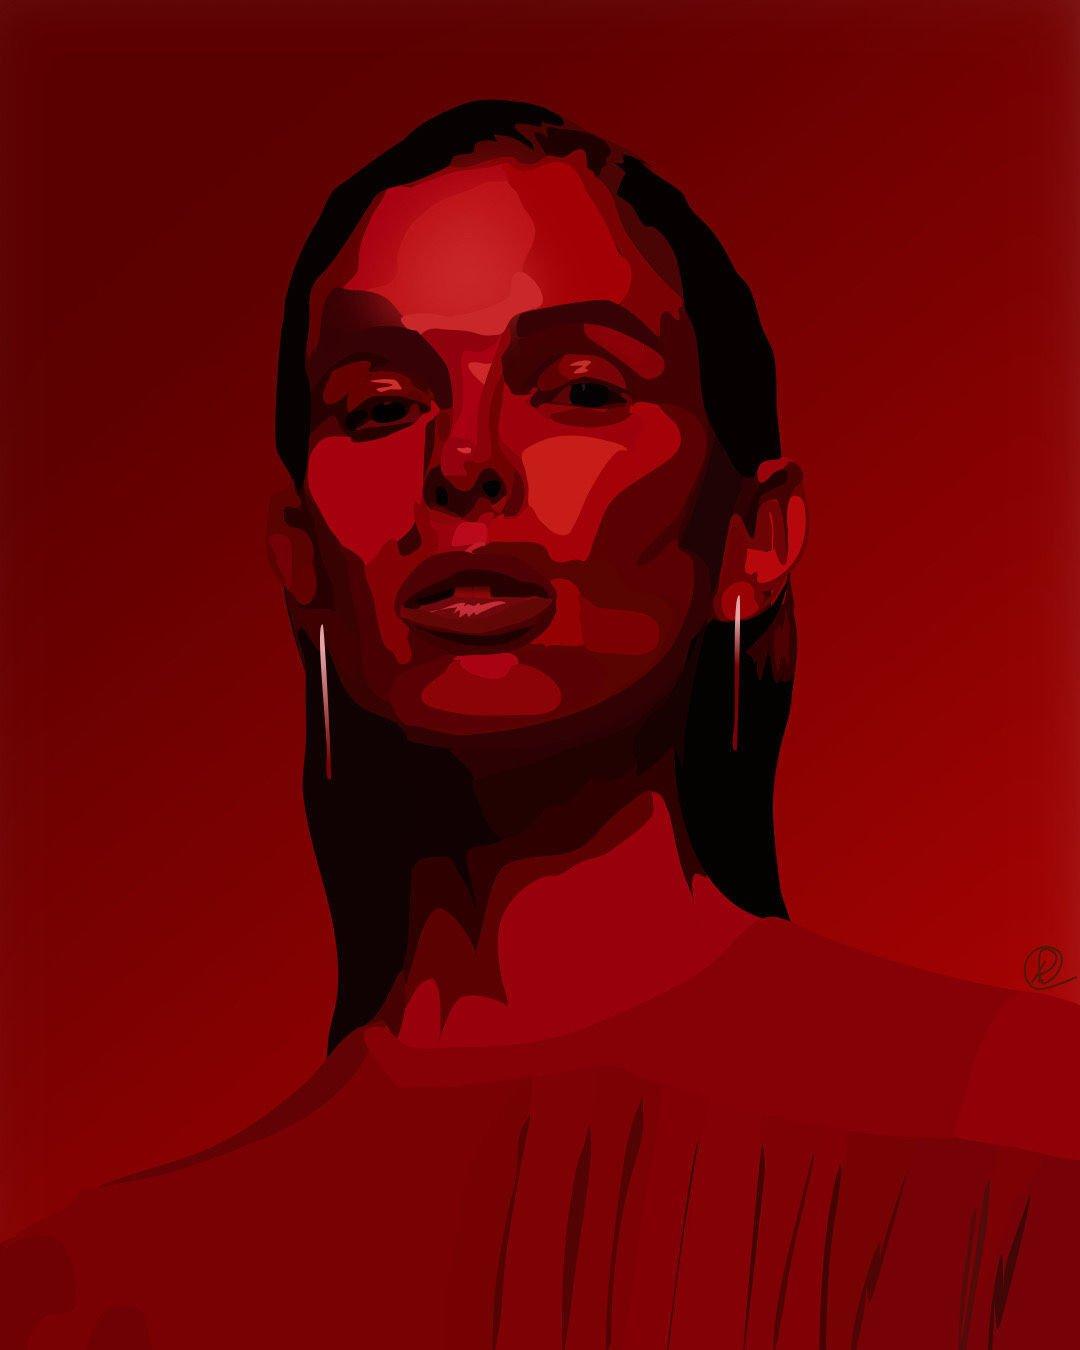 red lady portrait